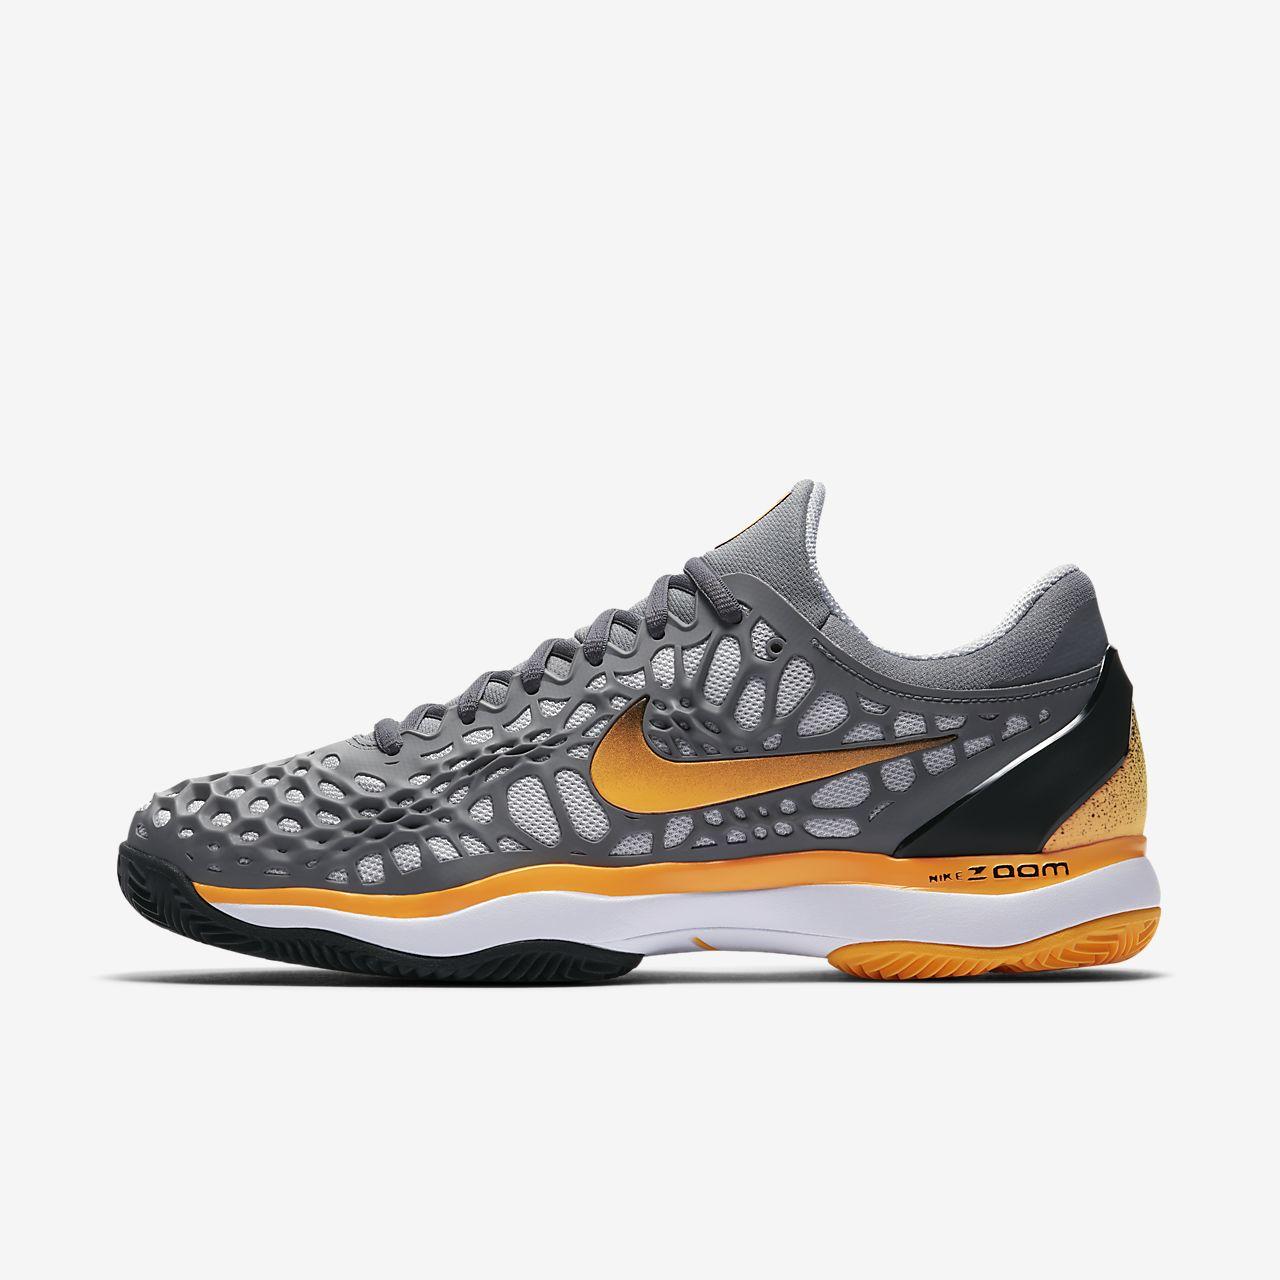 Nike 92aL9